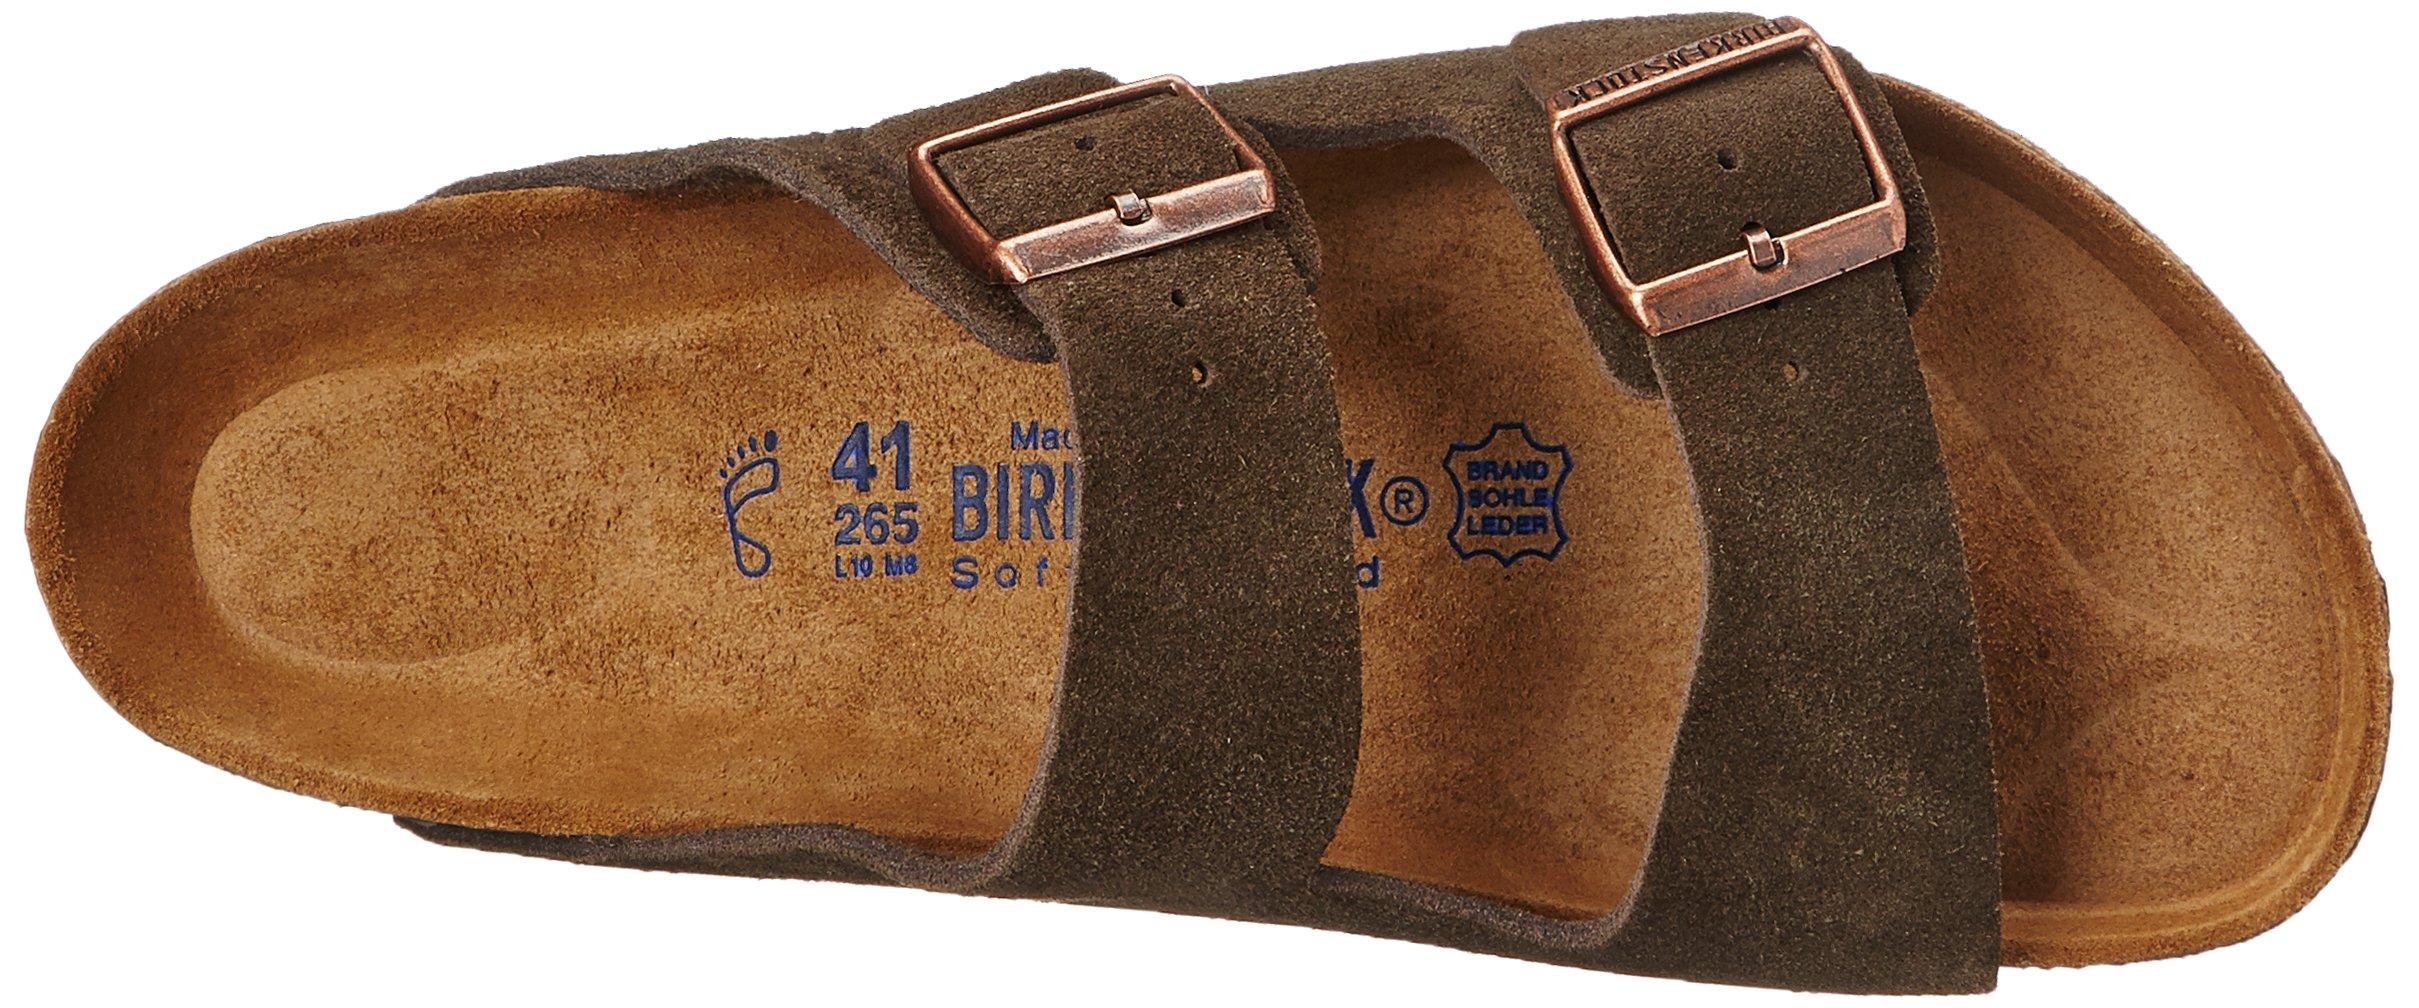 Birkenstock Unisex Arizona Mocha Suede Sandals - 35 N EU / 4-4.5 2A(N) US by Birkenstock (Image #8)